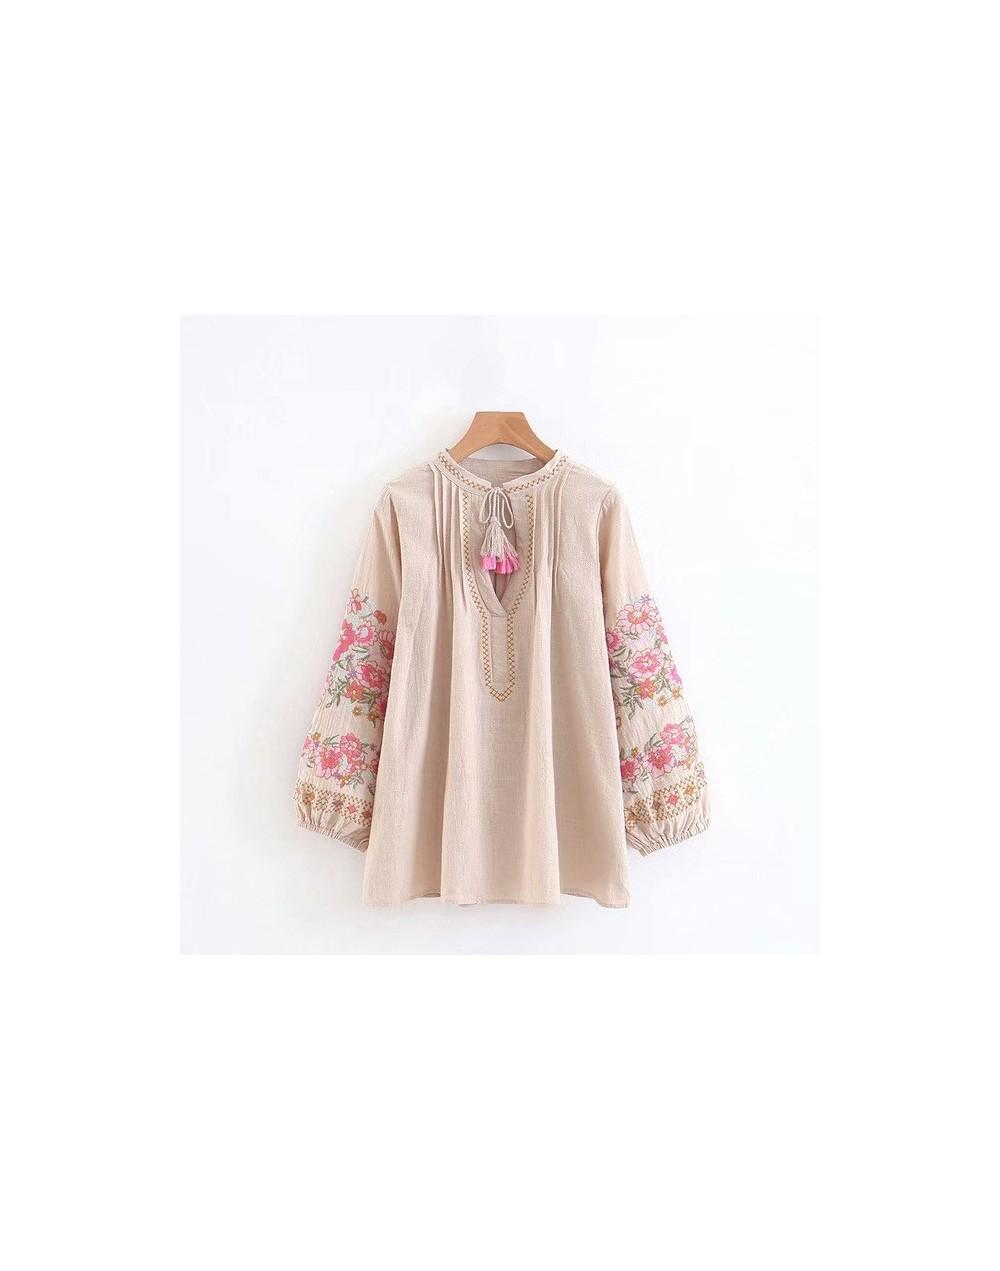 Spring women bohemian Tassel shirt cute beach floral embroidery linen cotton blouse shirt flare sleeve loose Boho shirts blu...